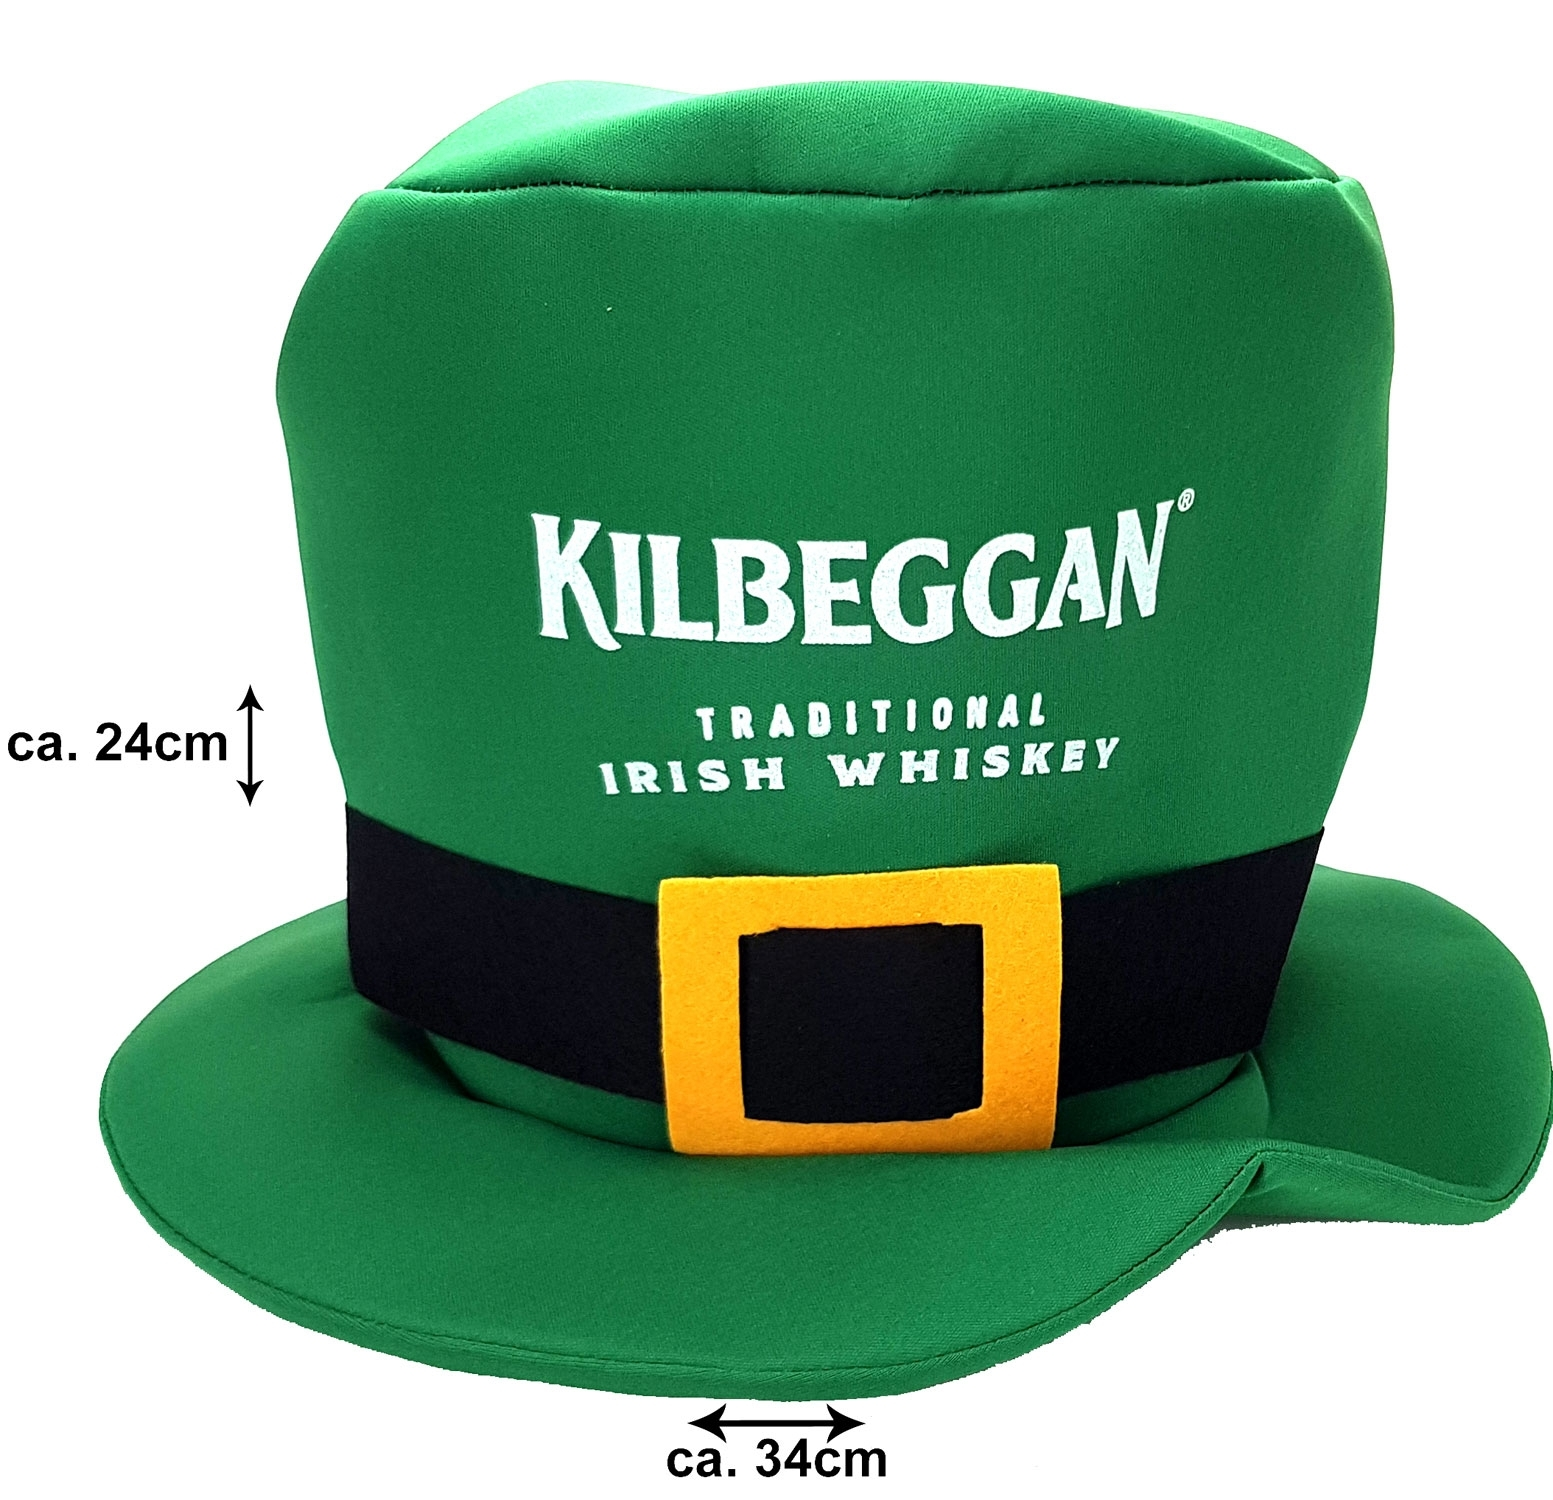 Kilbeggan Kobold Hut für Karneval / Halloween / St. Patricks Day Material : 100% Polyester